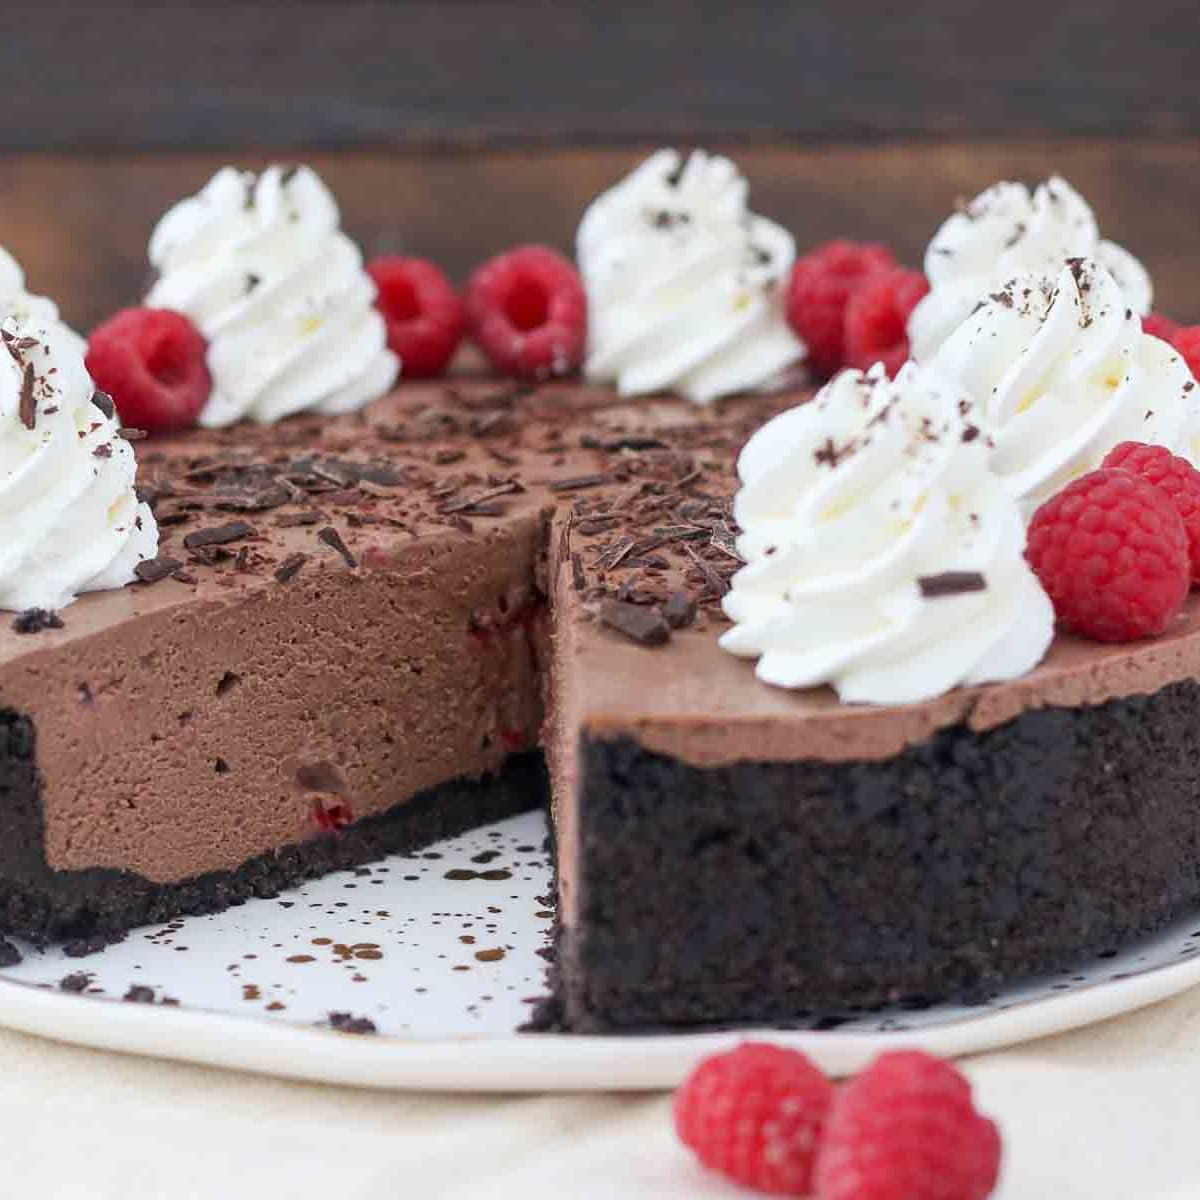 No Bake Chocolate Raspberry Cheesecake Recipe